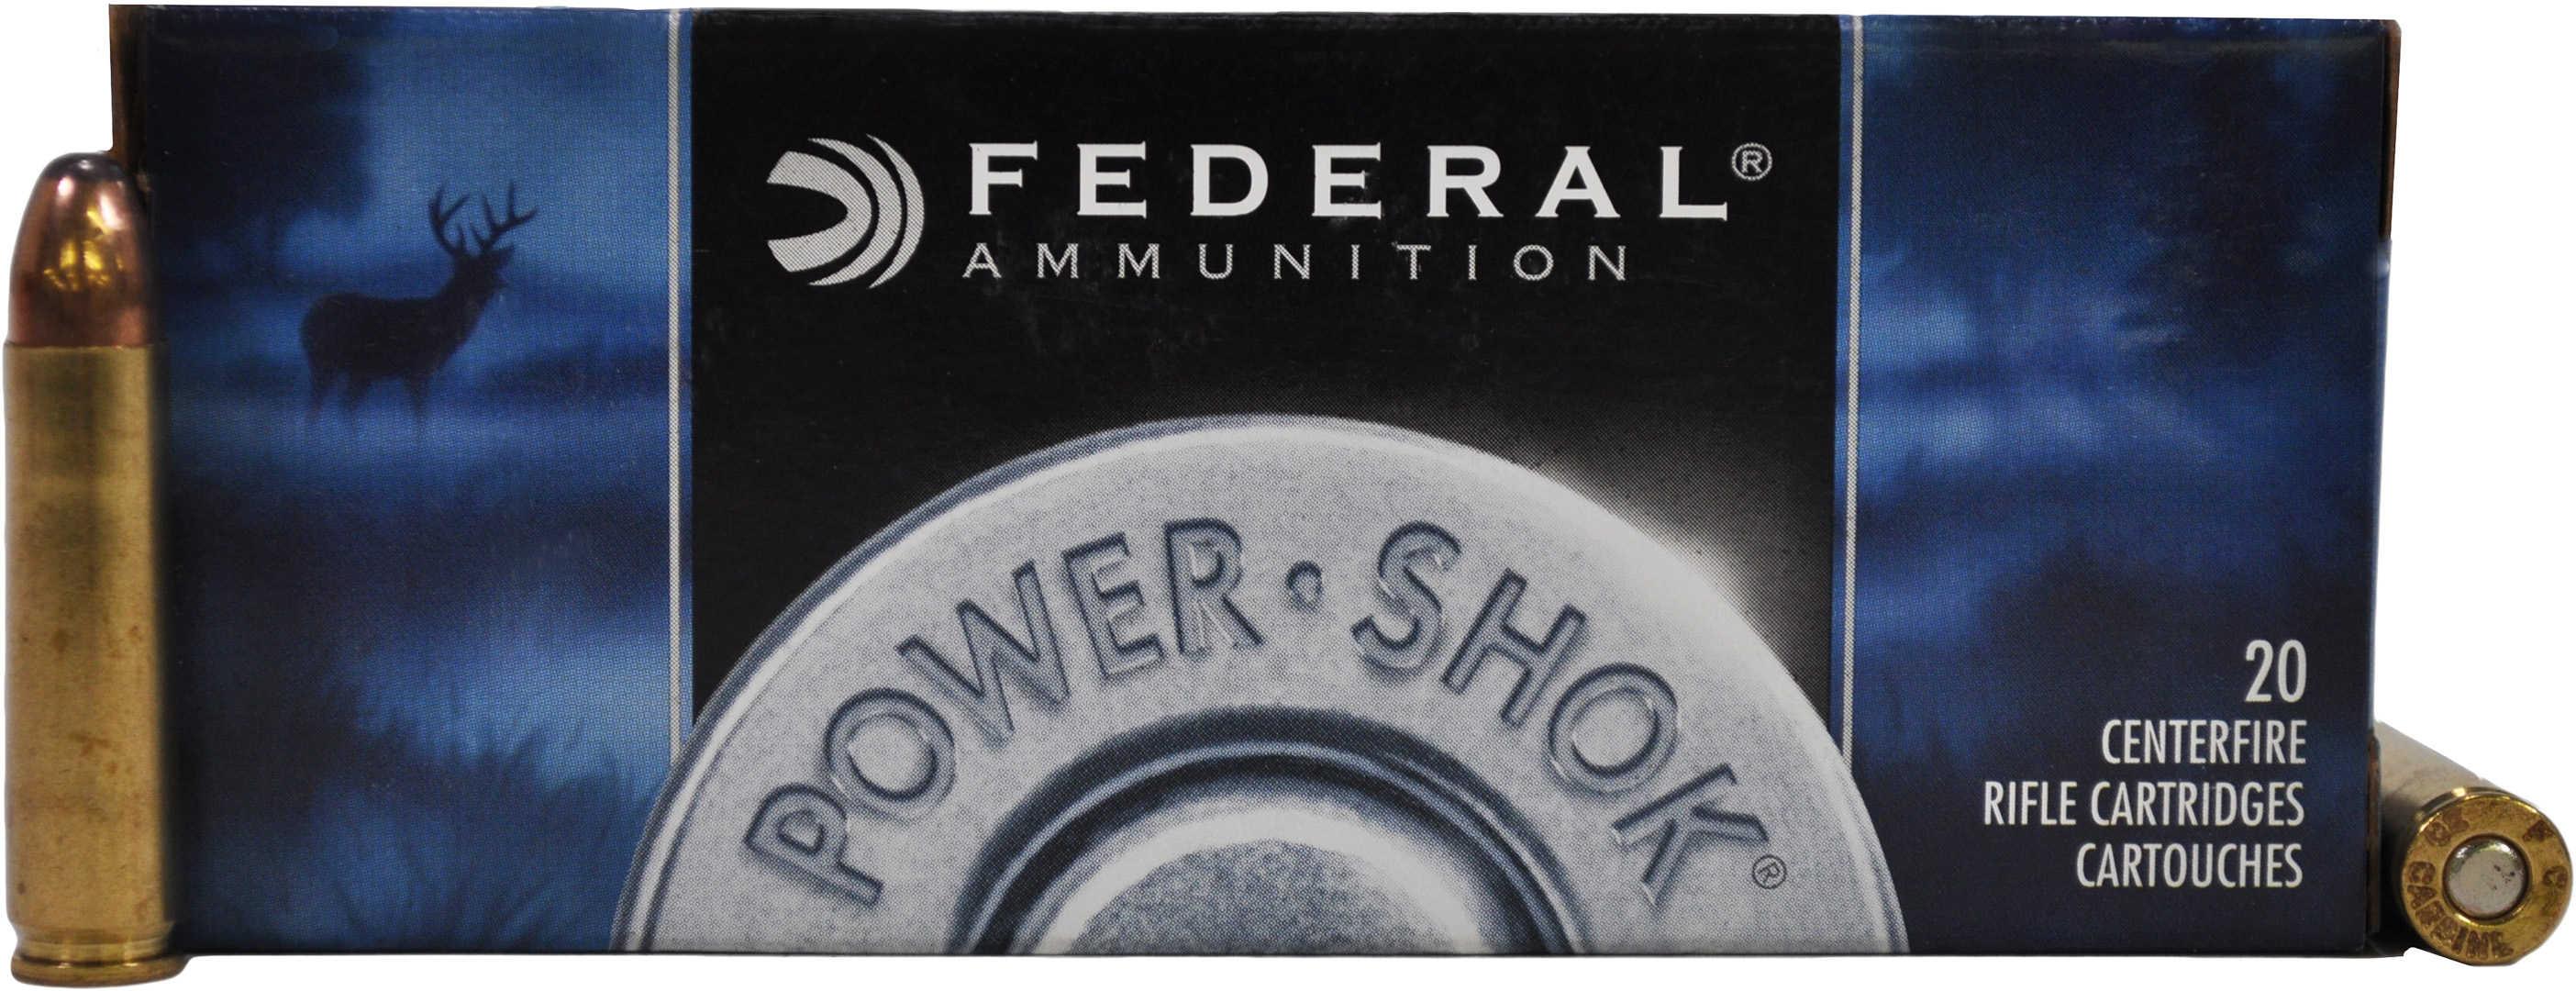 Federal PowerShok 30 Carbine 100 Grain Soft Point Round Nose 20 Round Box 30CA